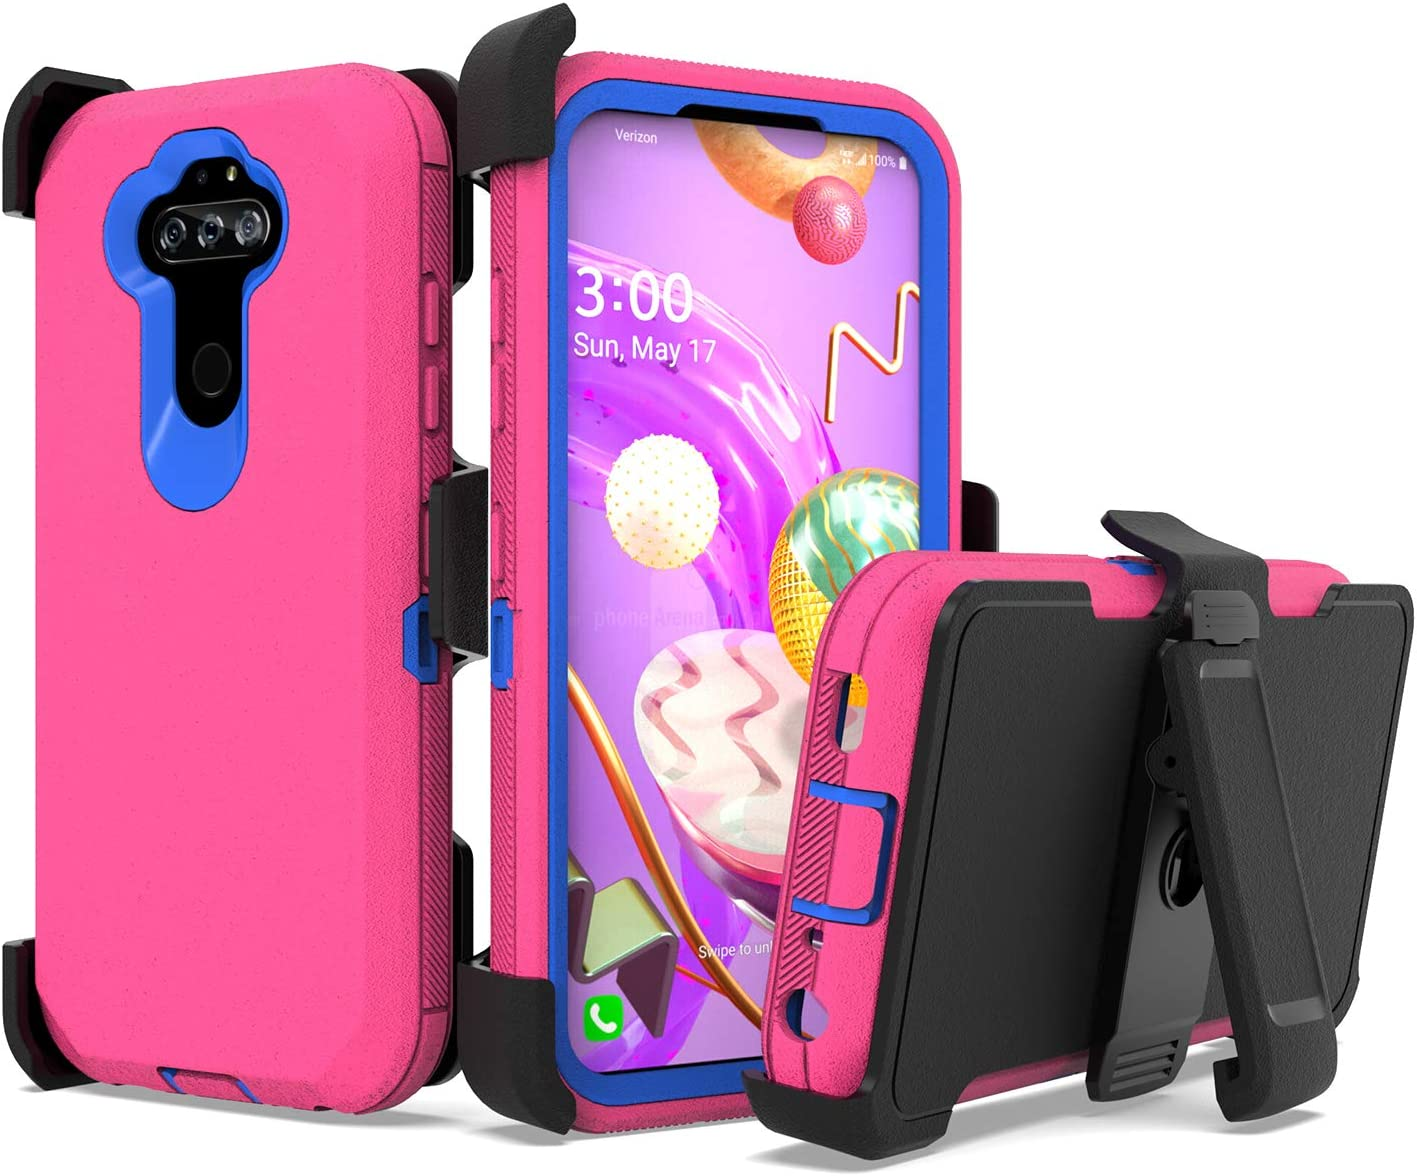 UNC Pro Belt Clip Holster Cell Phone Case for LG Aristo 5/Aristo 5 Plus +/K31/Phoenix 5/Fortune 3/Tribute Monarch/K8x/Risio 4, Heavy Duty Hybrid Shockproof Bumper Case w/Kickstand, Hot Pink/Blue